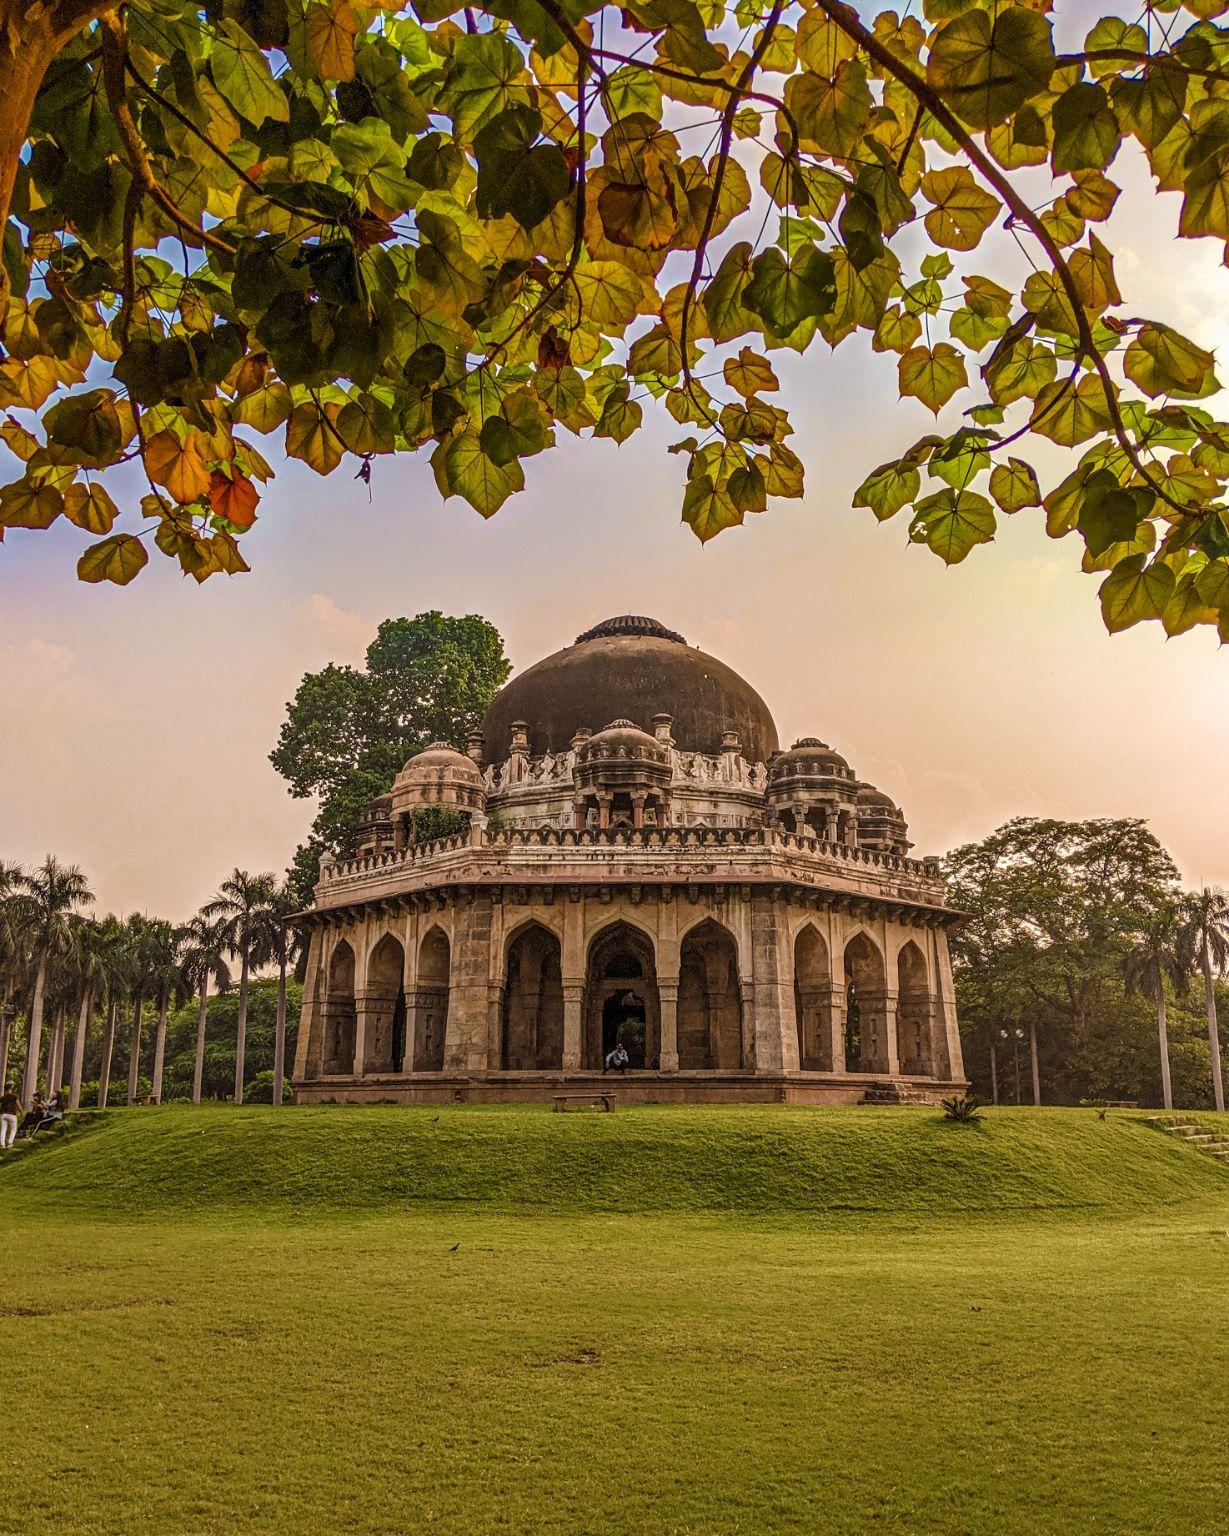 Photo of Lodhi Garden By fotosbyshadab